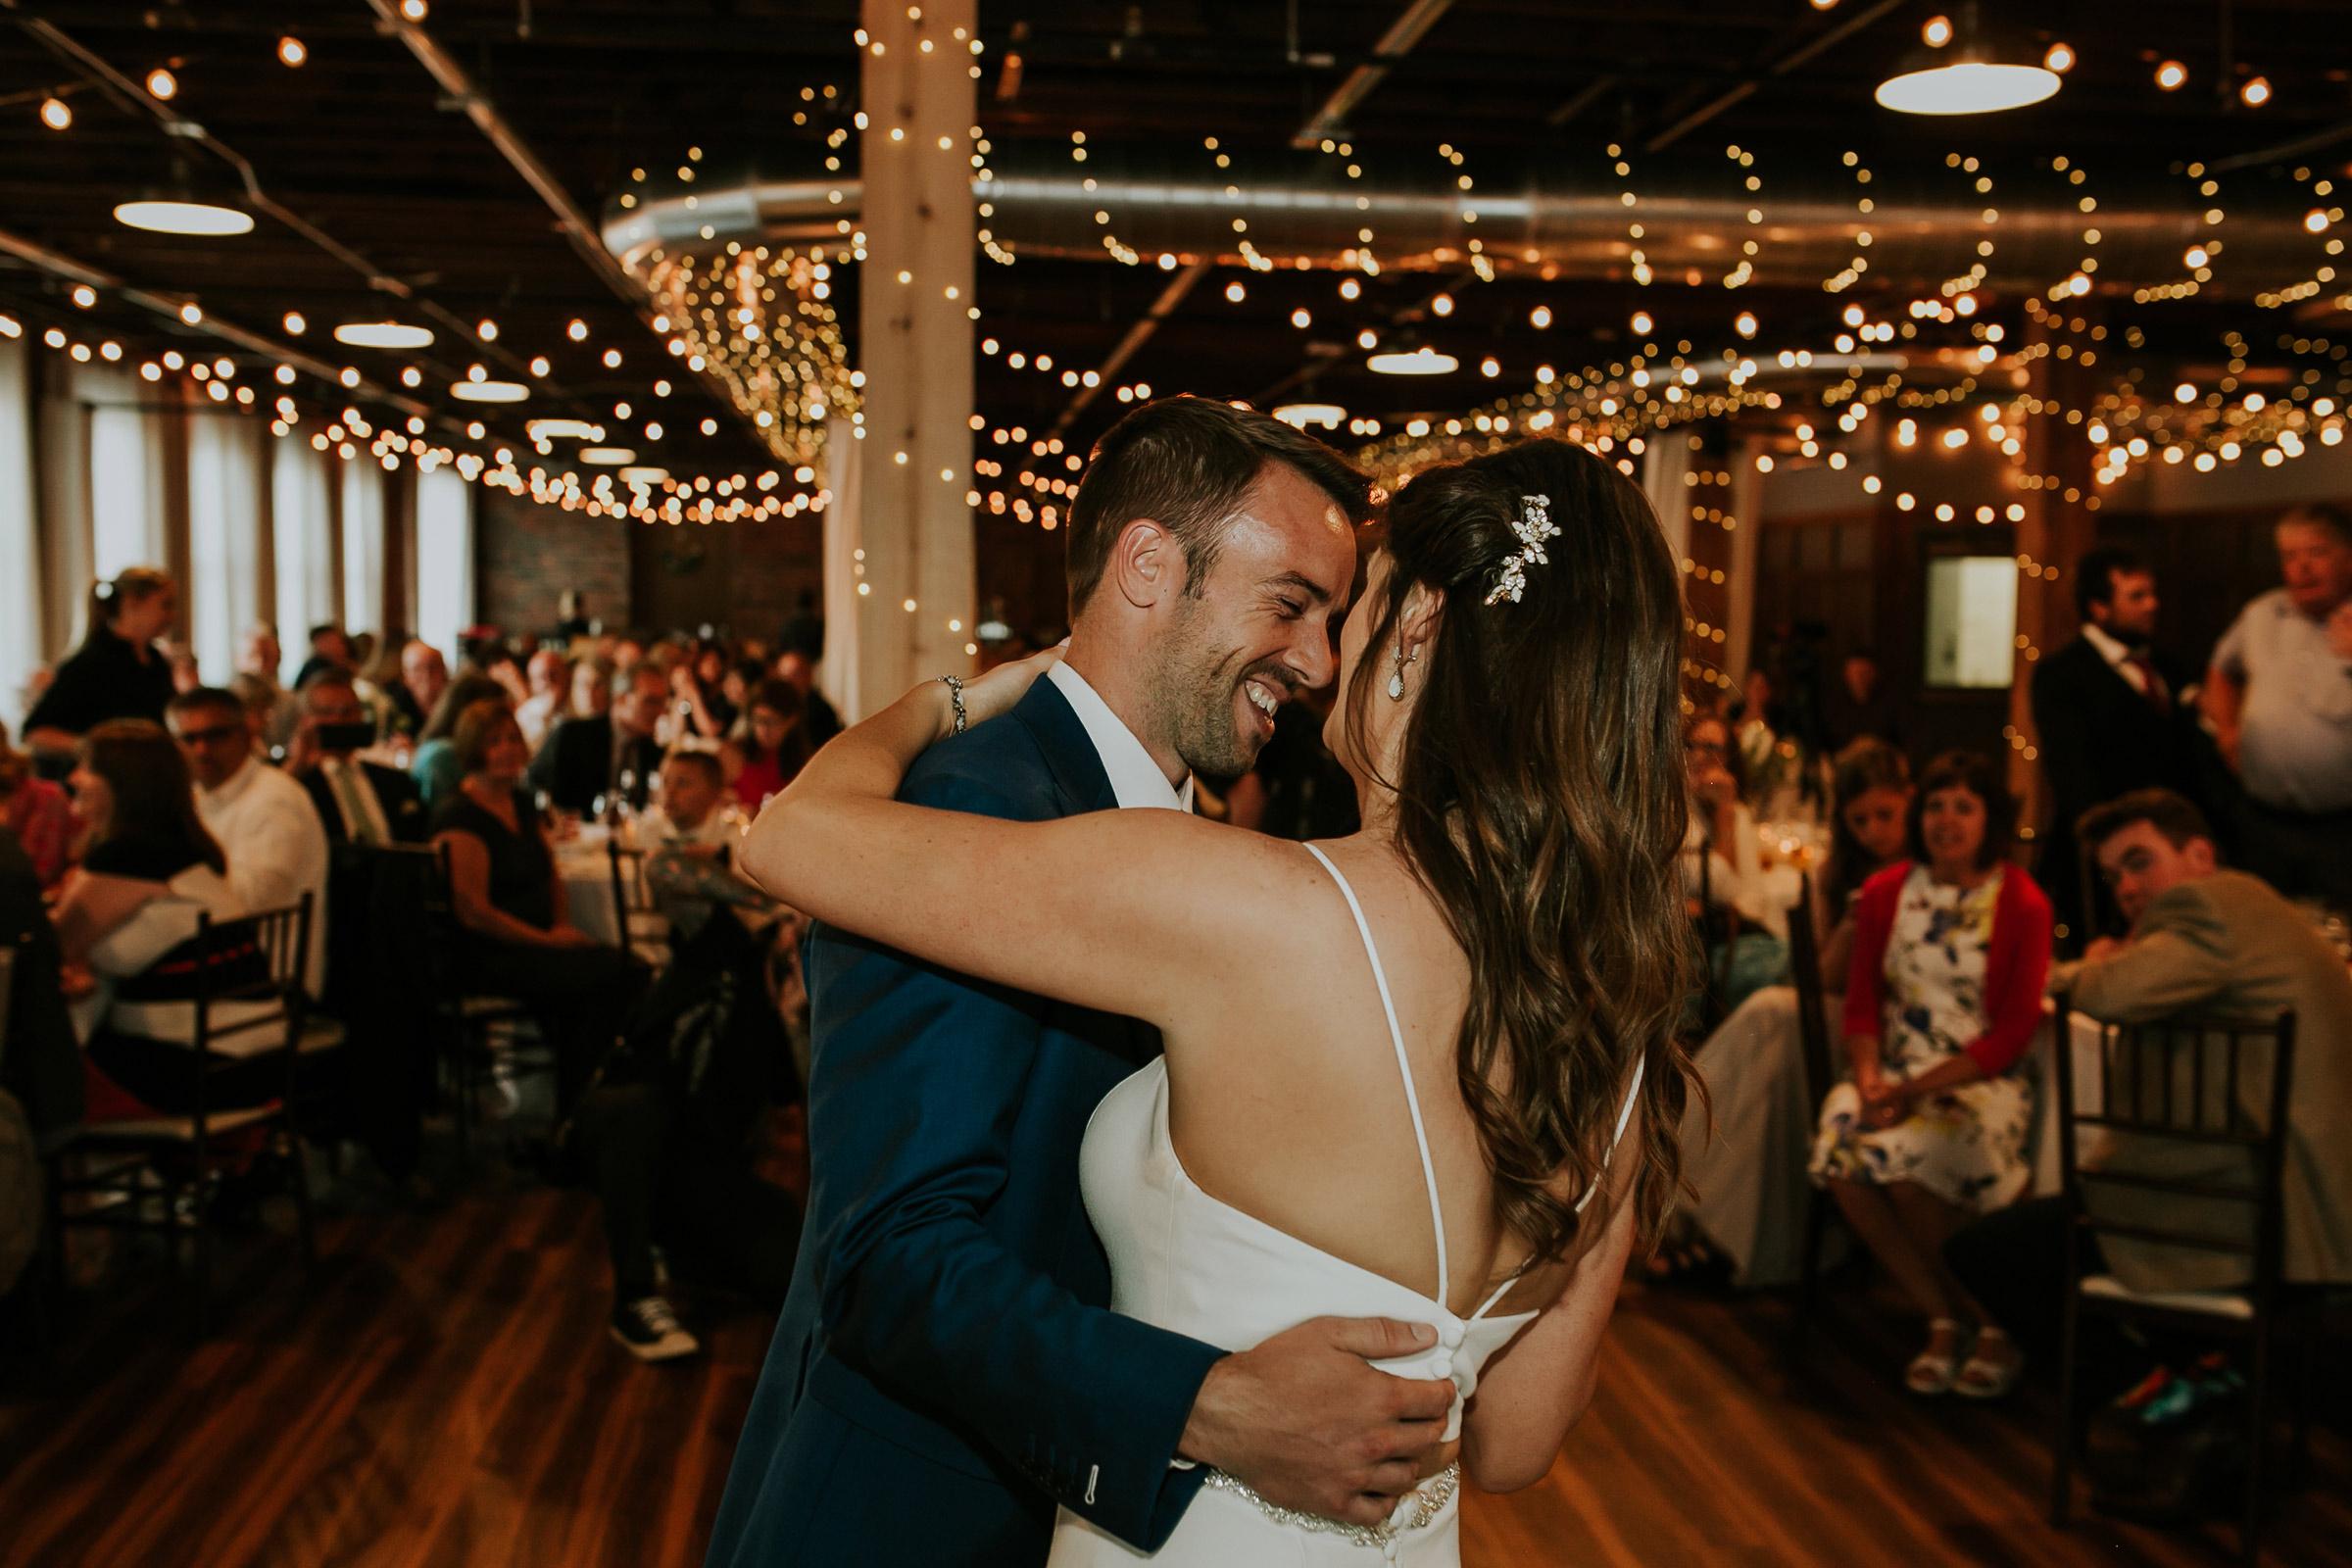 mr-mrs-hull-wedding-bride-groom-first-dance-iowa-taproom-desmoines-iowa-raelyn-ramey-photography-586.jpg